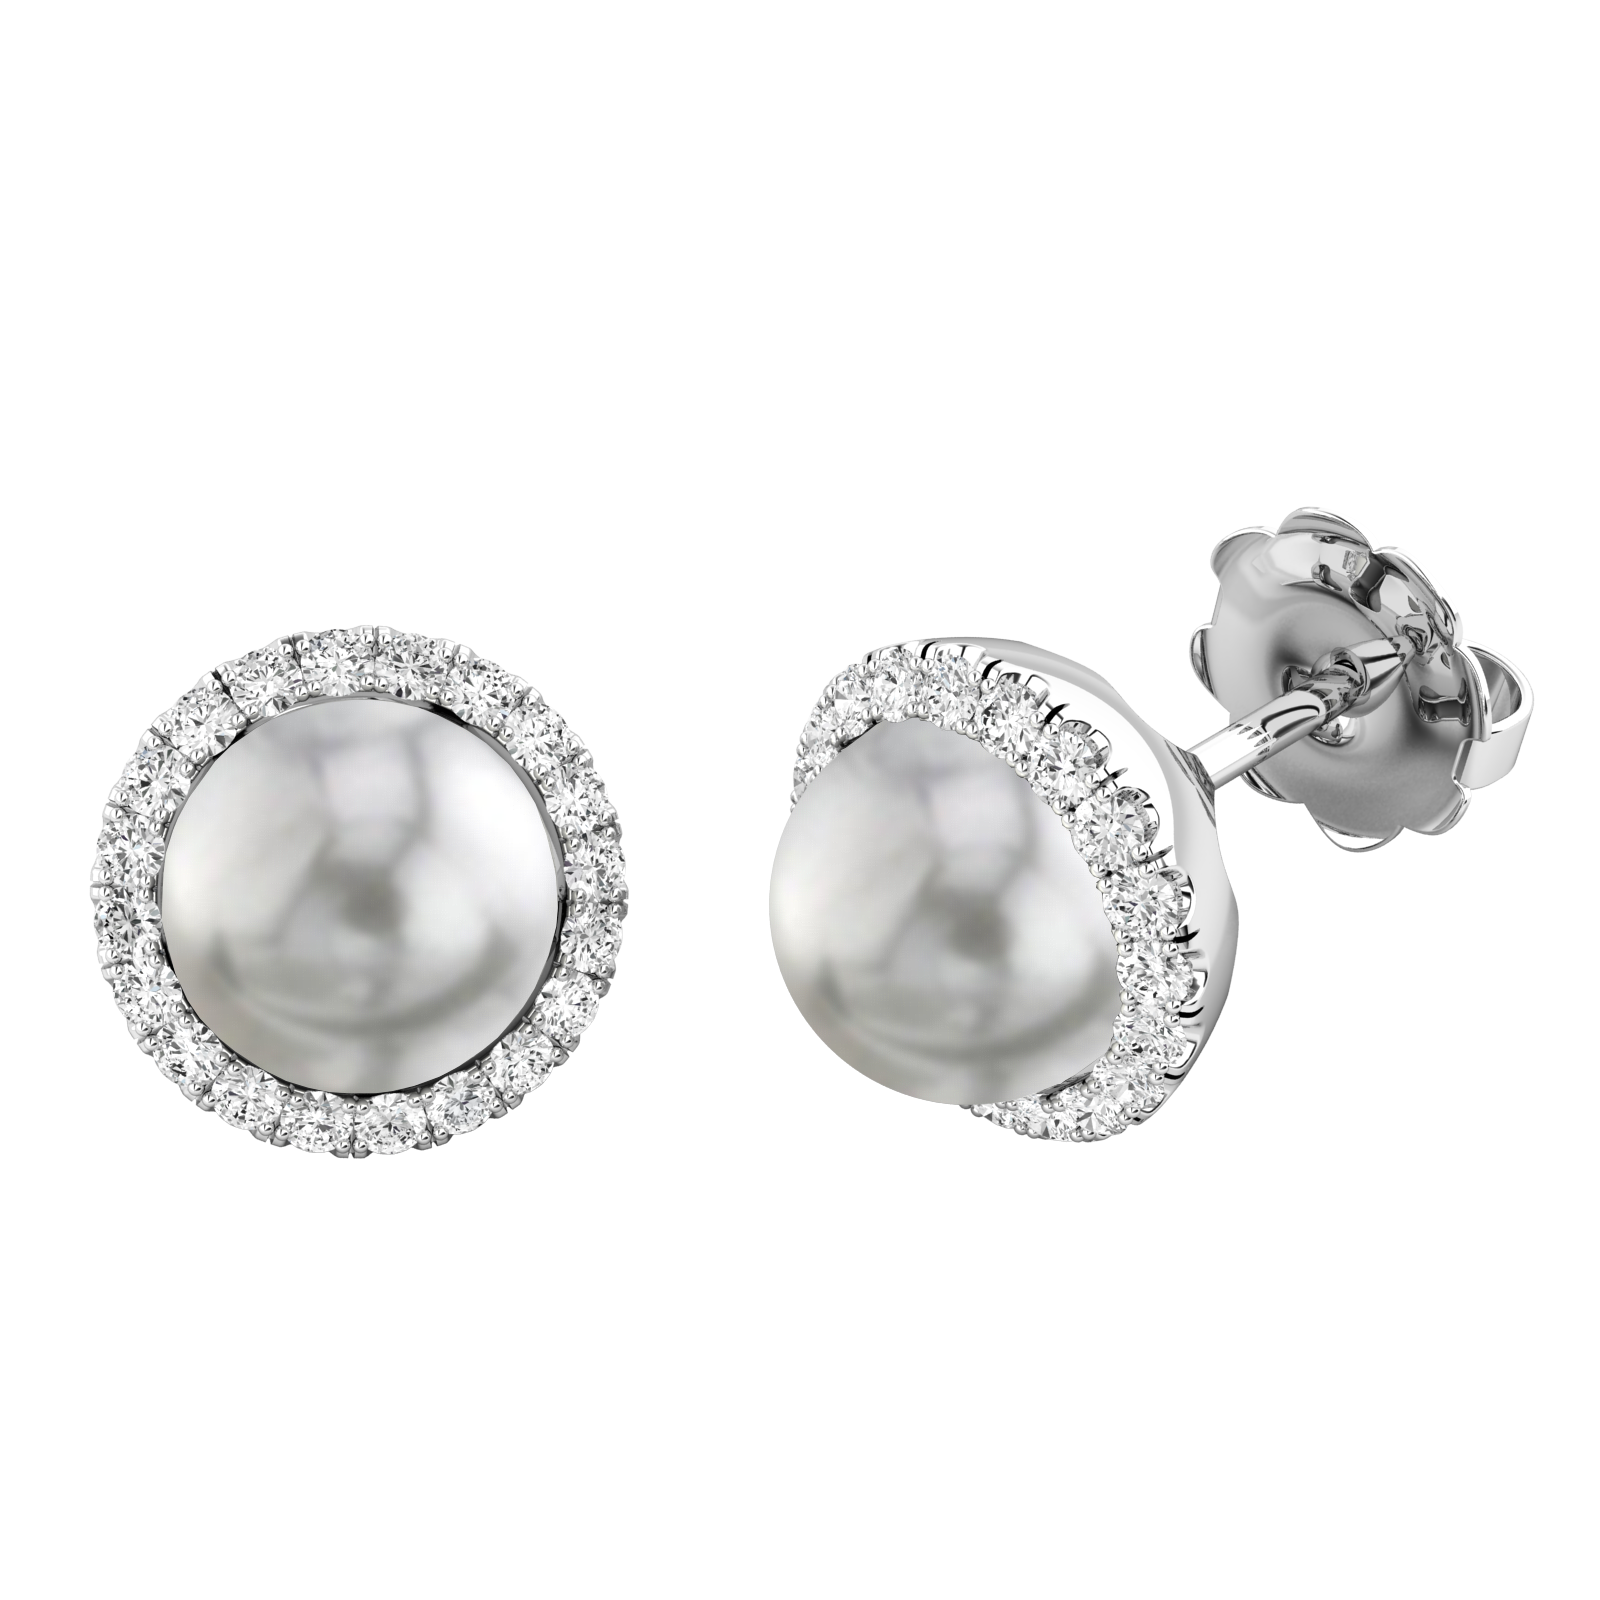 Cercei Stud Aur Alb 18kt cu Perle Argintiu Inchis si Diamante Rotunde Briliant-img1